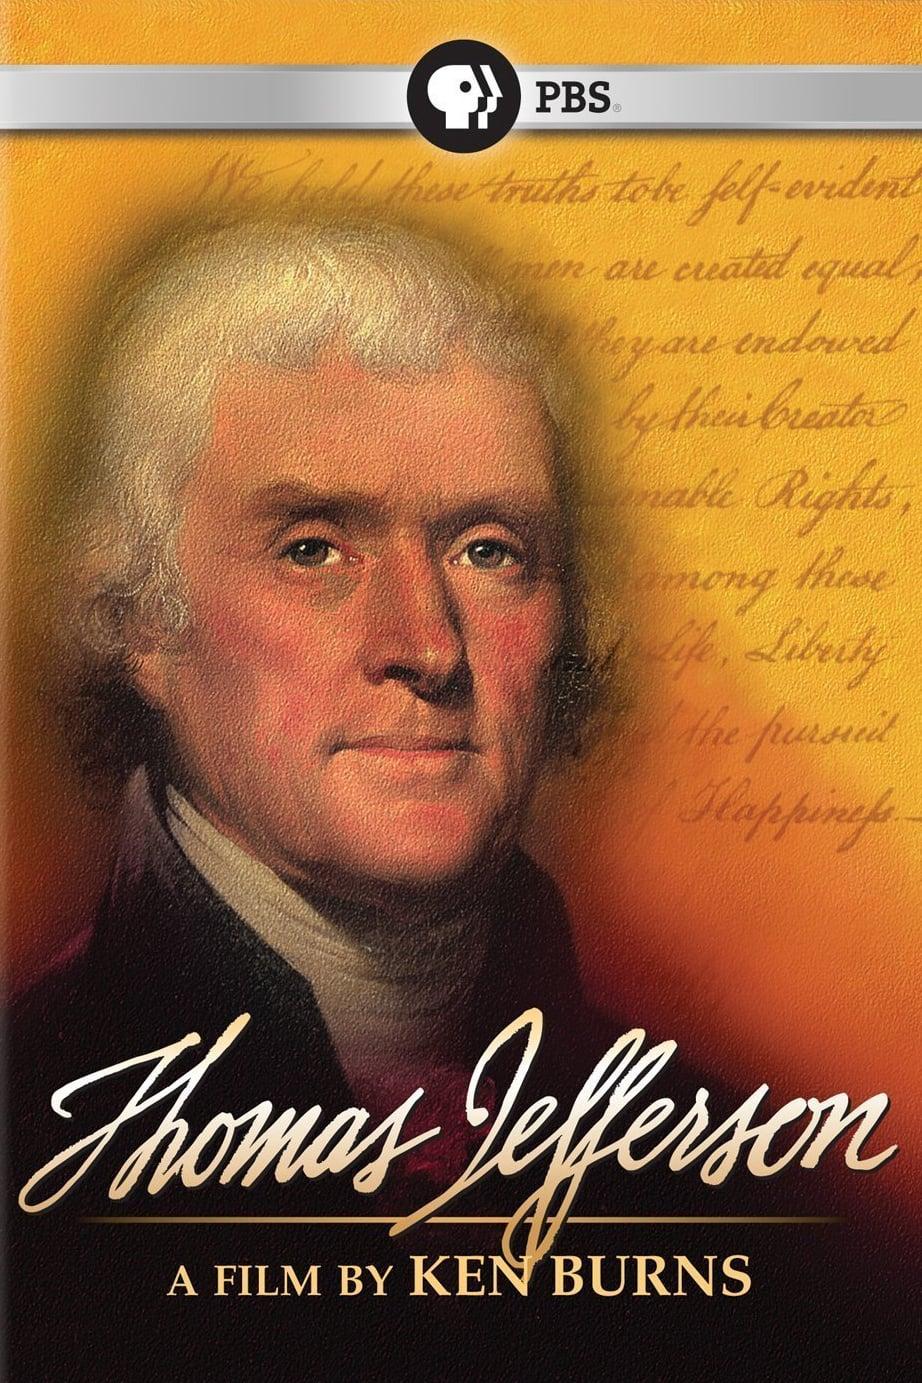 Thomas Jefferson TV Shows About American Revolution